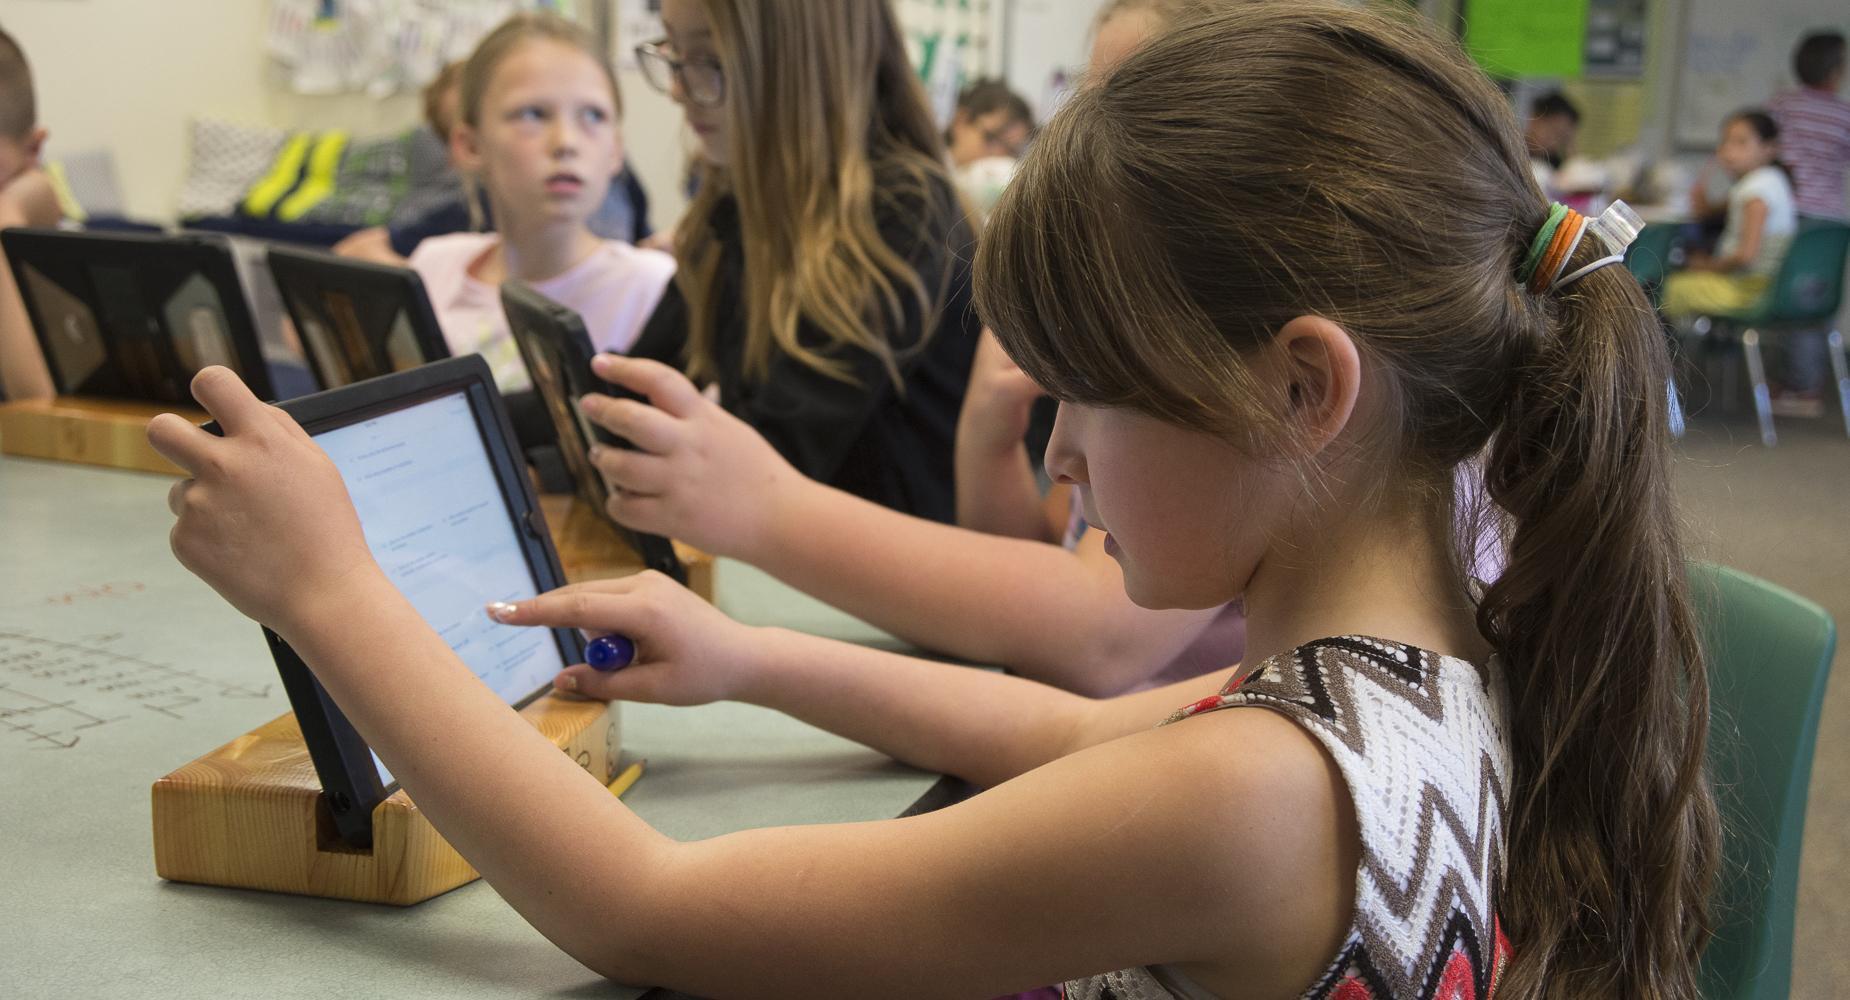 Girl at desk work on iPad.